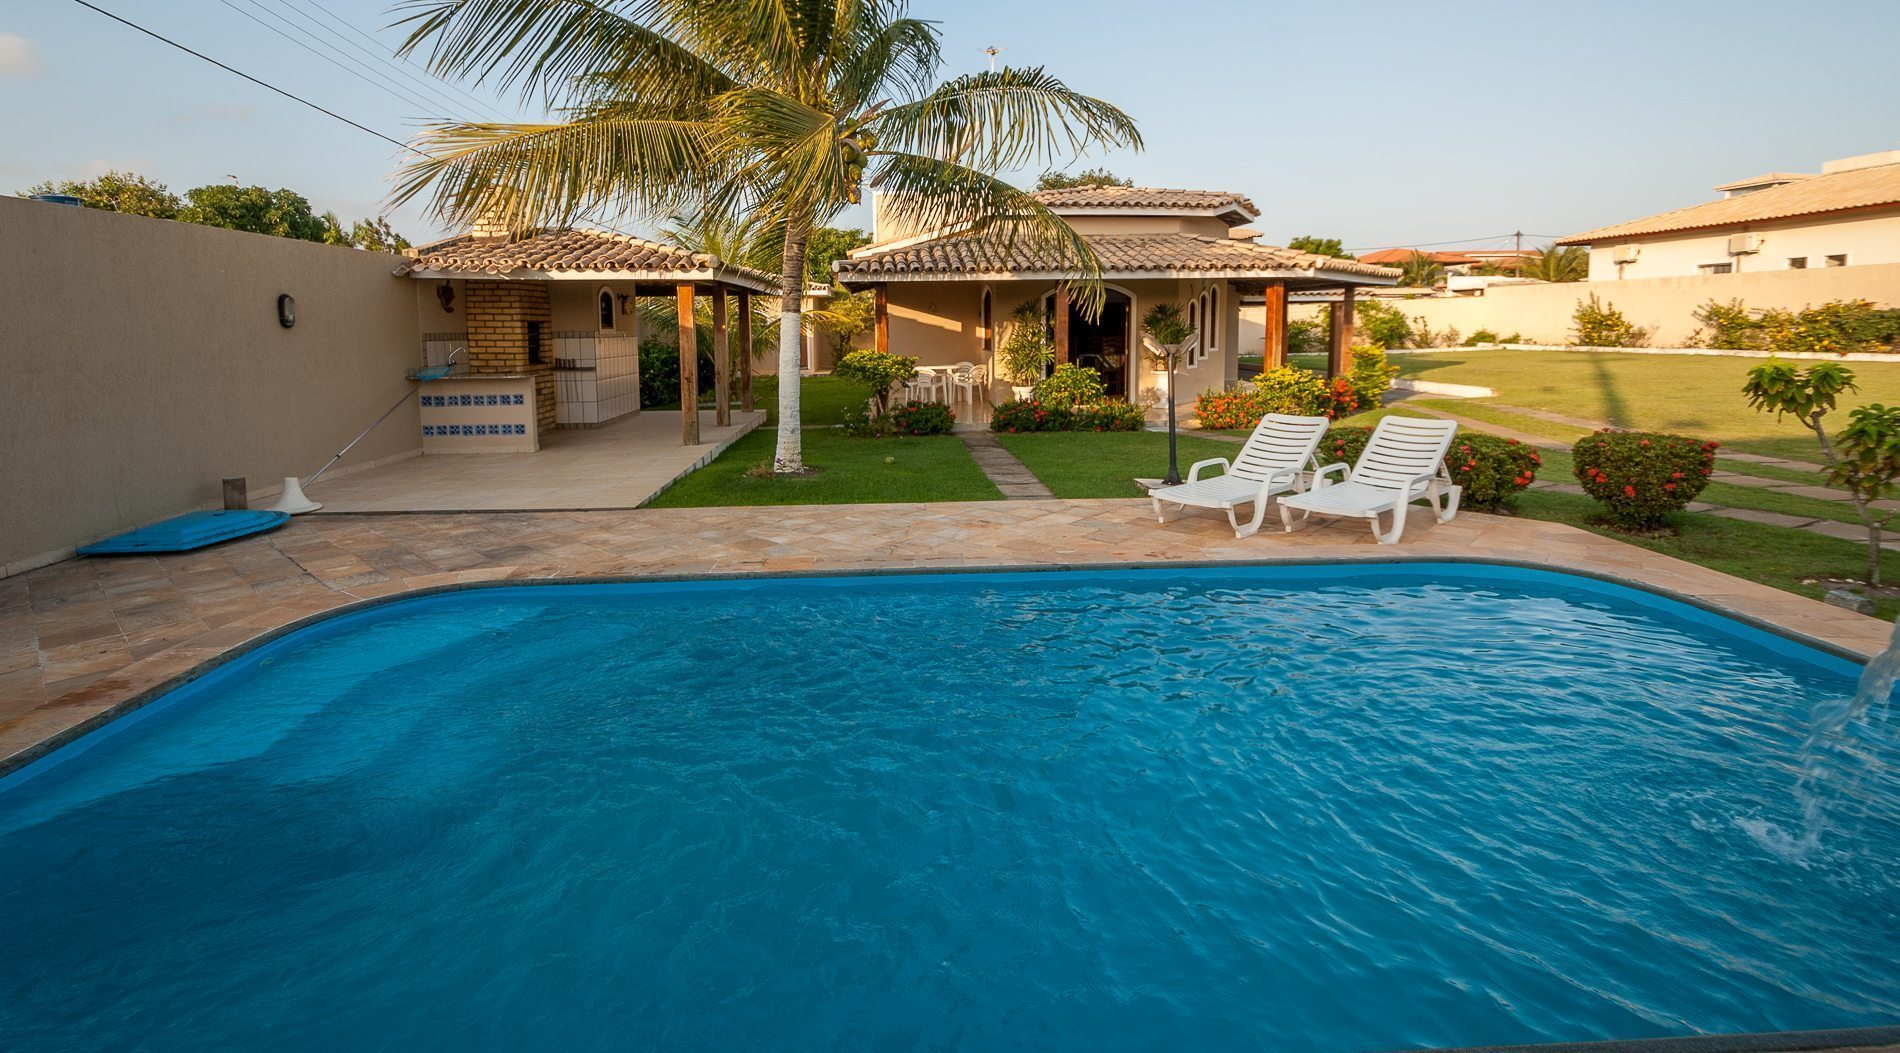 Casa com piscina barra do jacu pe hansen im veis for Piscina in casa